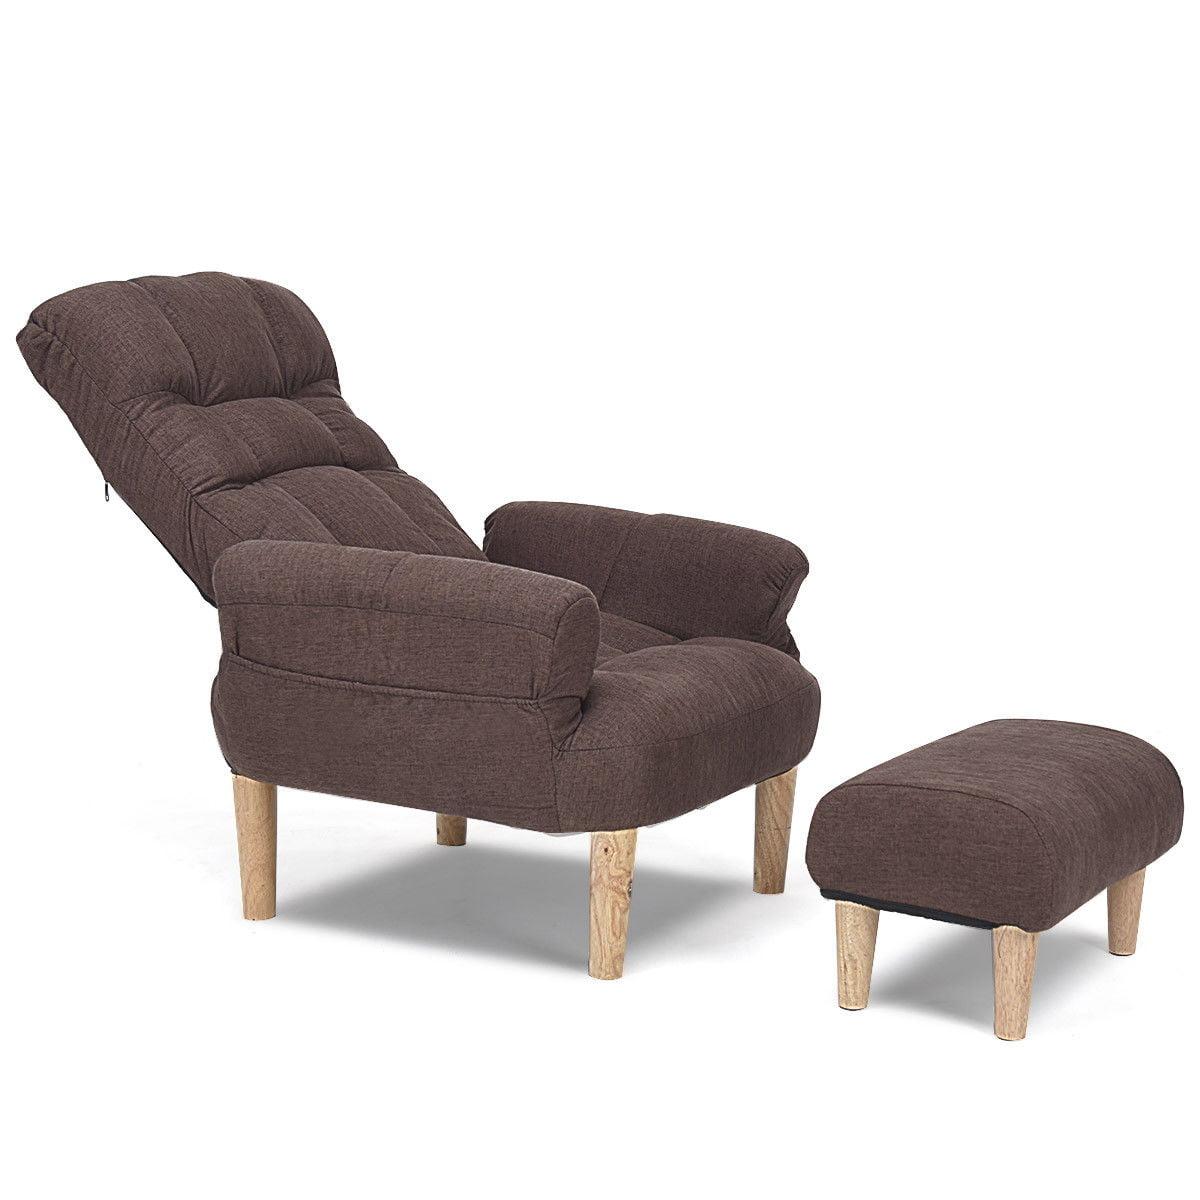 Lazy Sofa Chair W Footstool Armrest Living Room Backrest